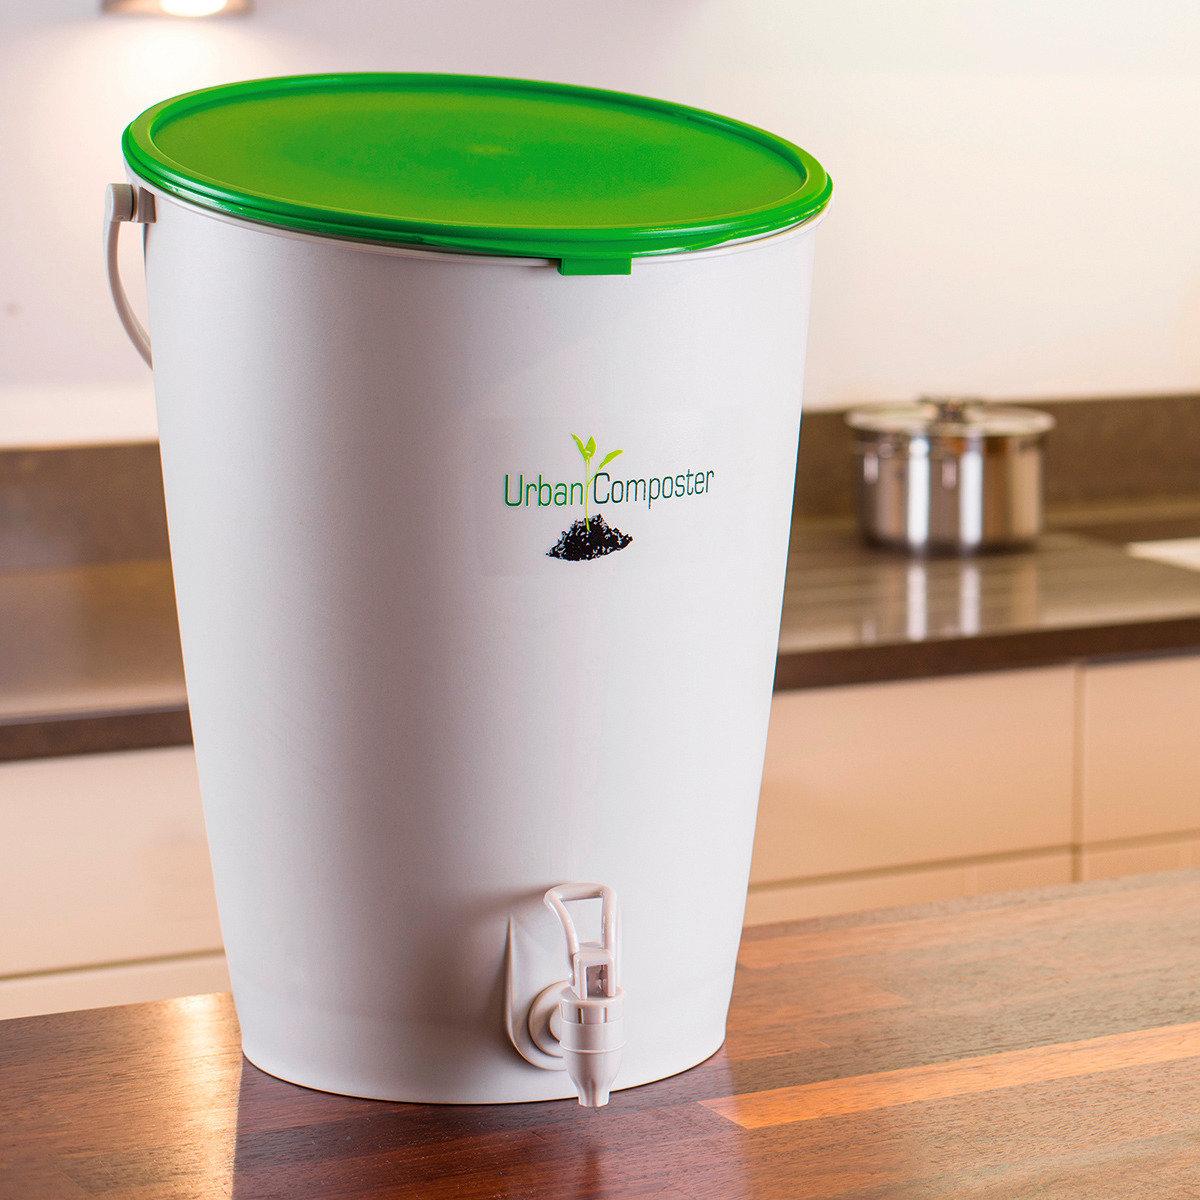 urban komposter 15 liter inkl kompost beschleuniger online kaufen bei g rtner p tschke. Black Bedroom Furniture Sets. Home Design Ideas